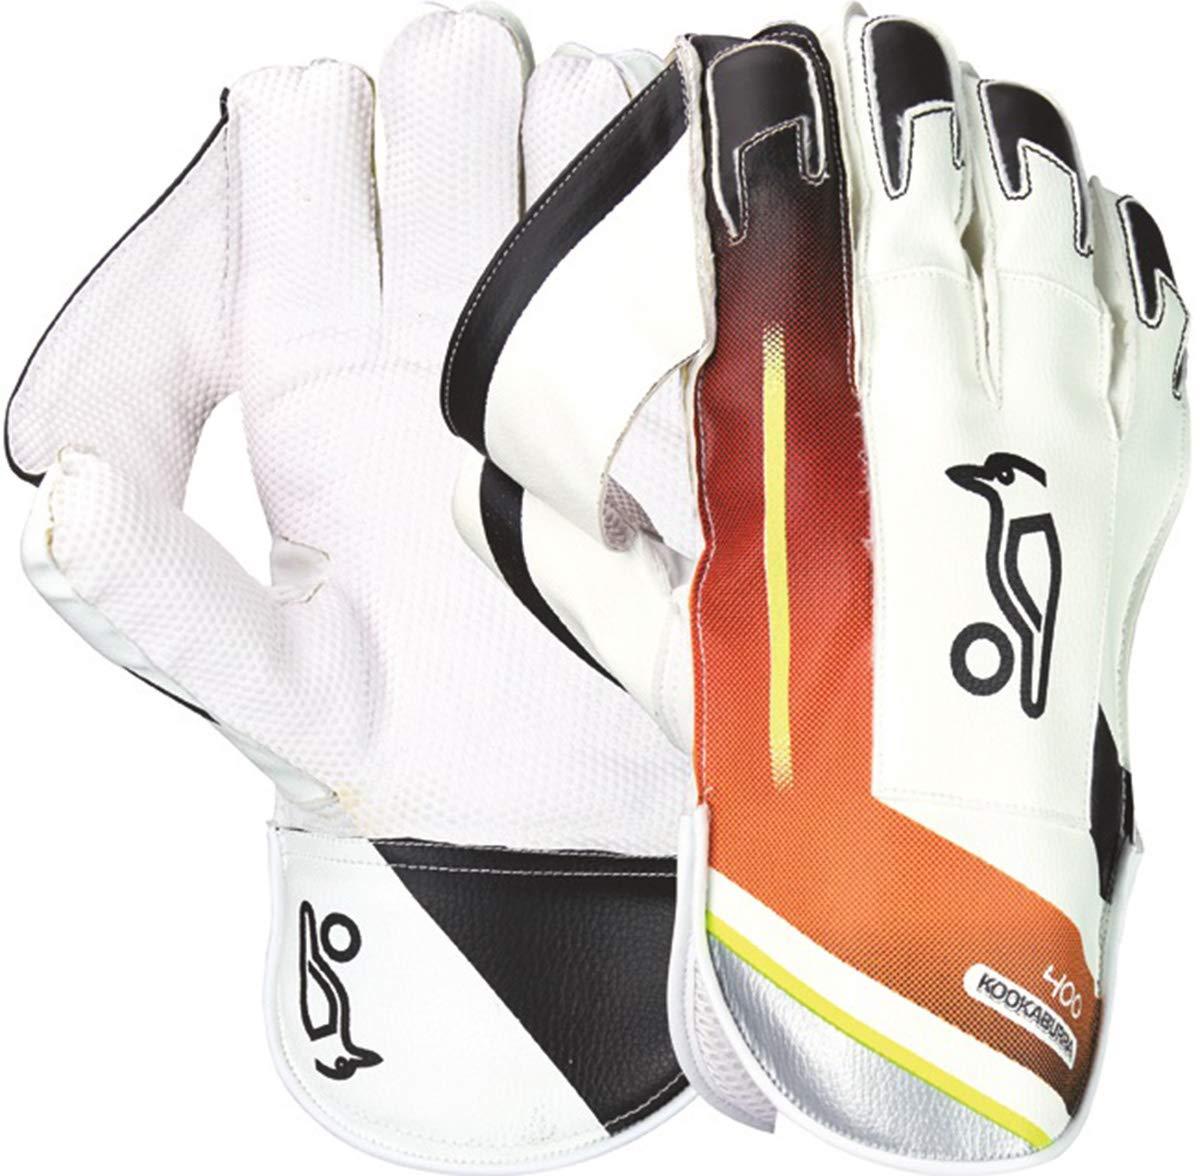 2019 Kookaburra 450 Wicket Keeping Gloves Size Adult Small Junior New